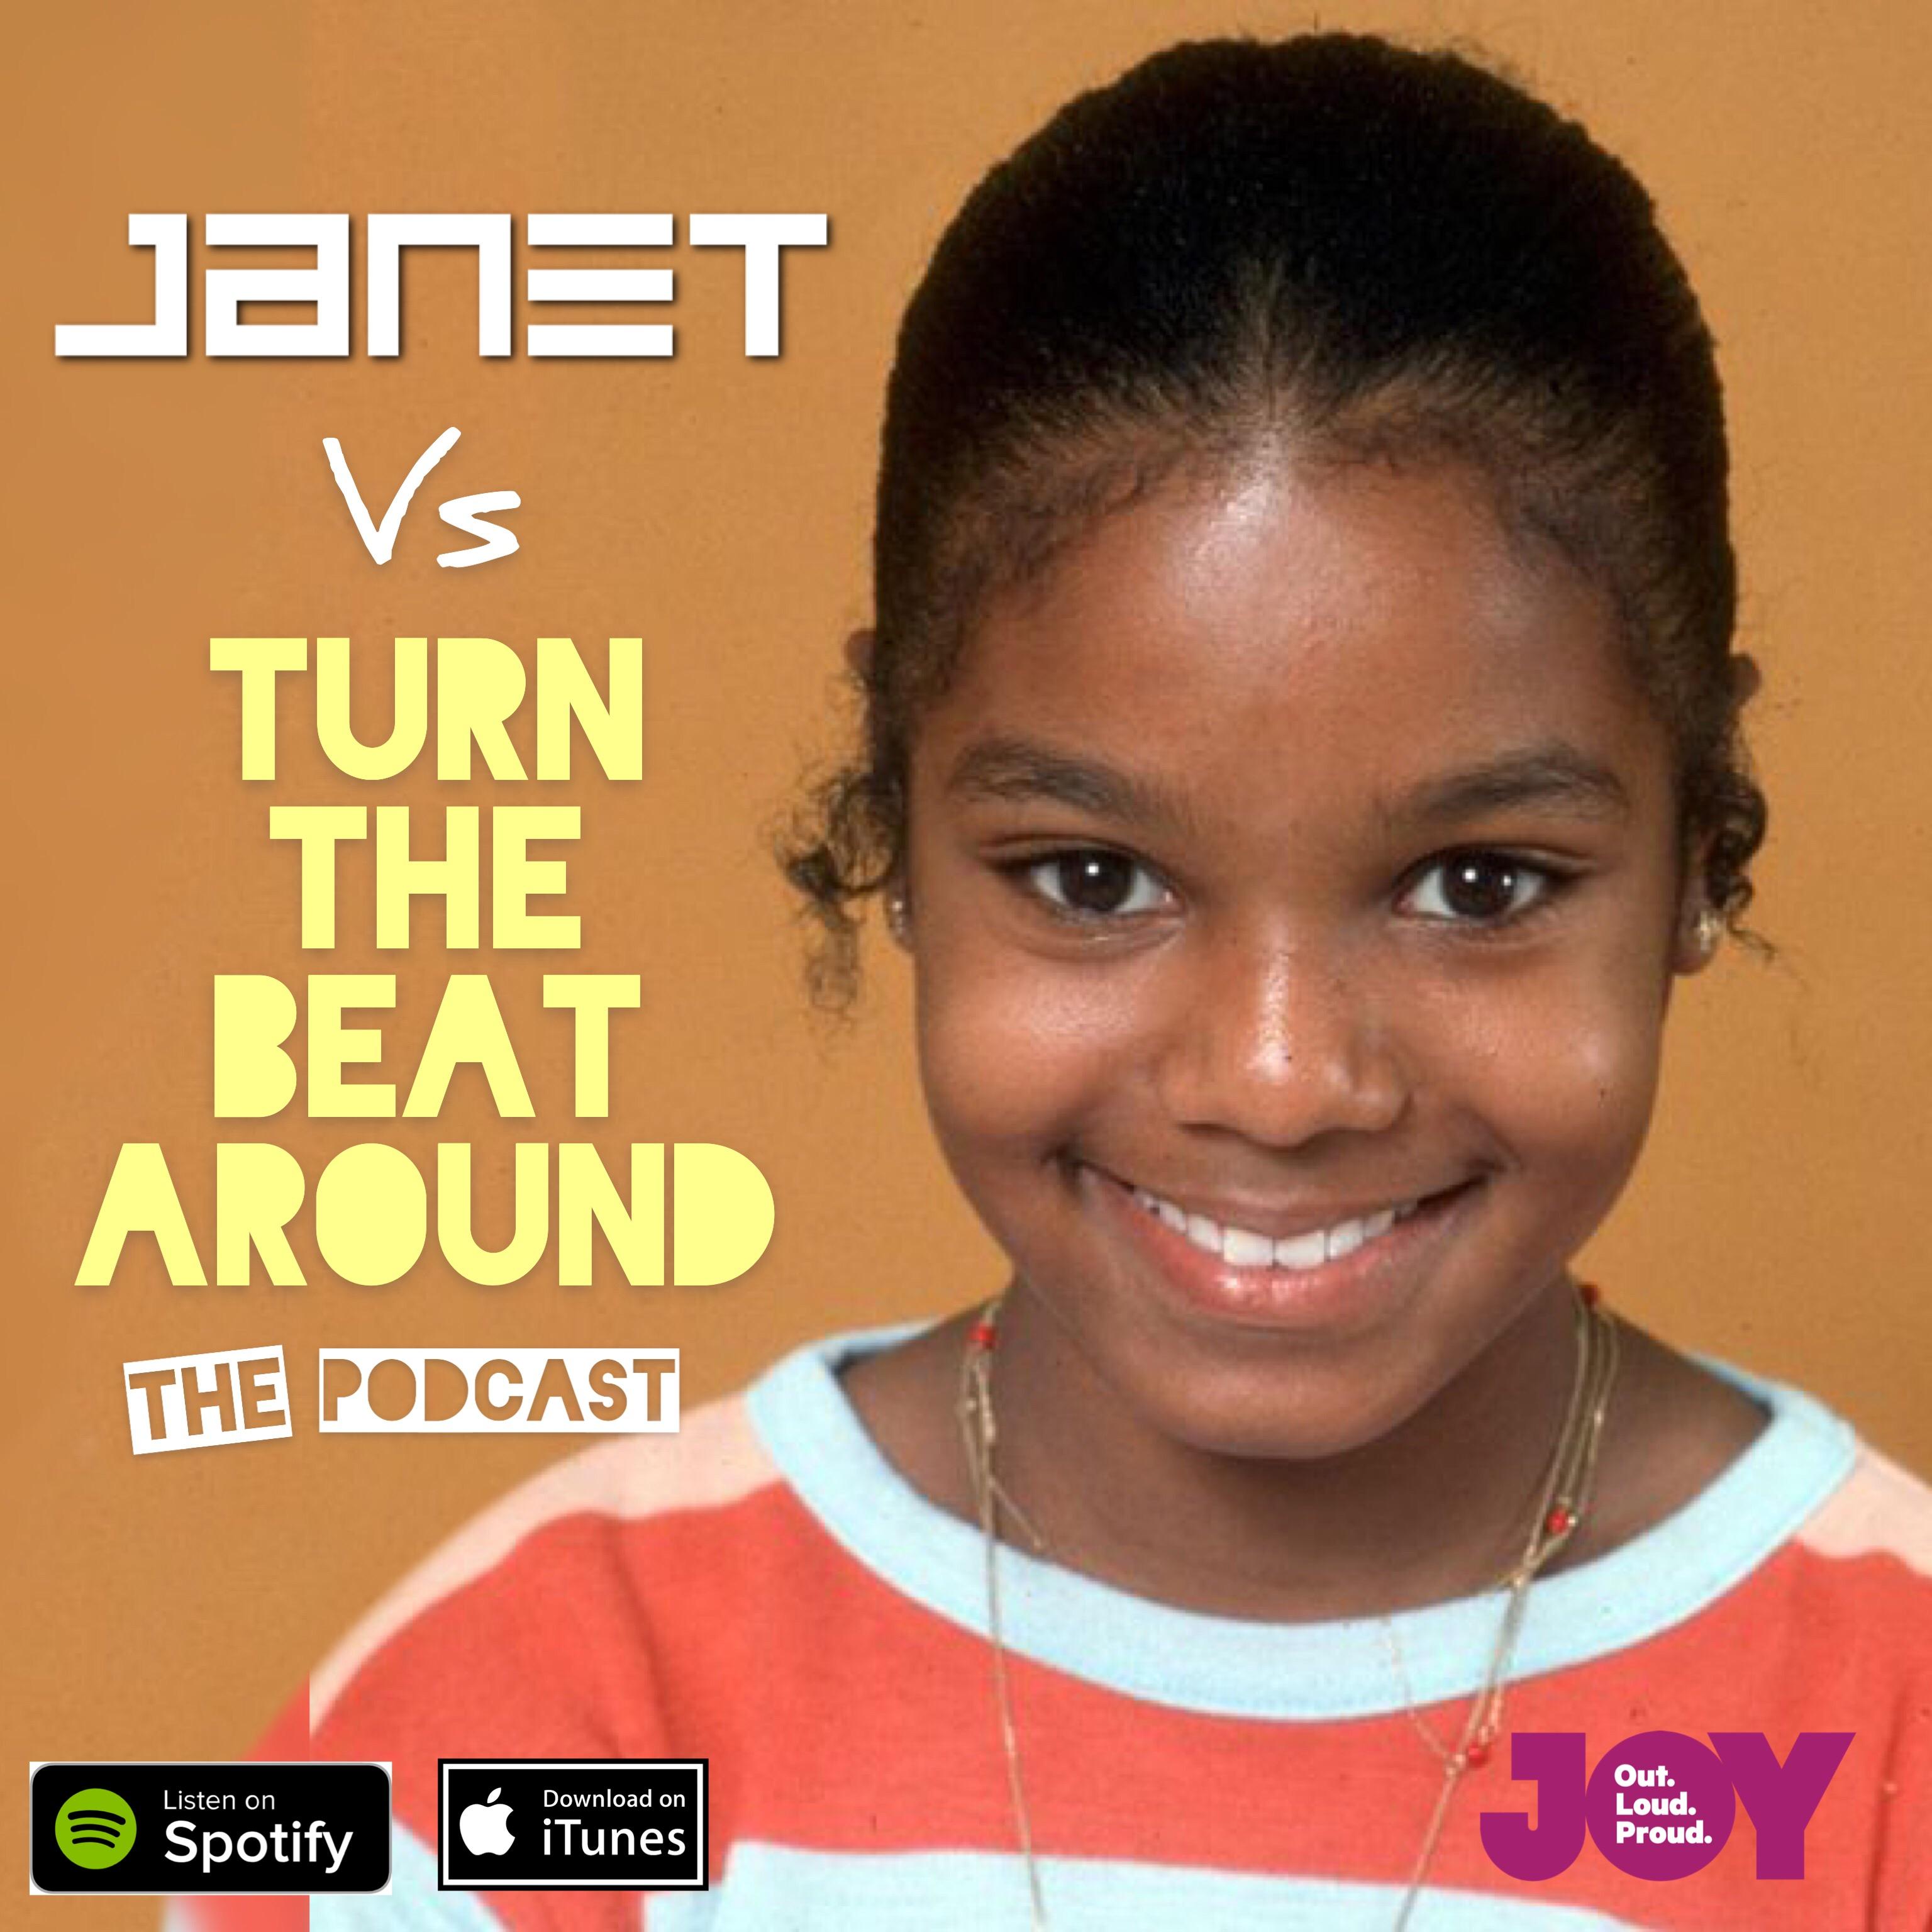 Janet Jackson - The Podcast | Turn the Beat Around